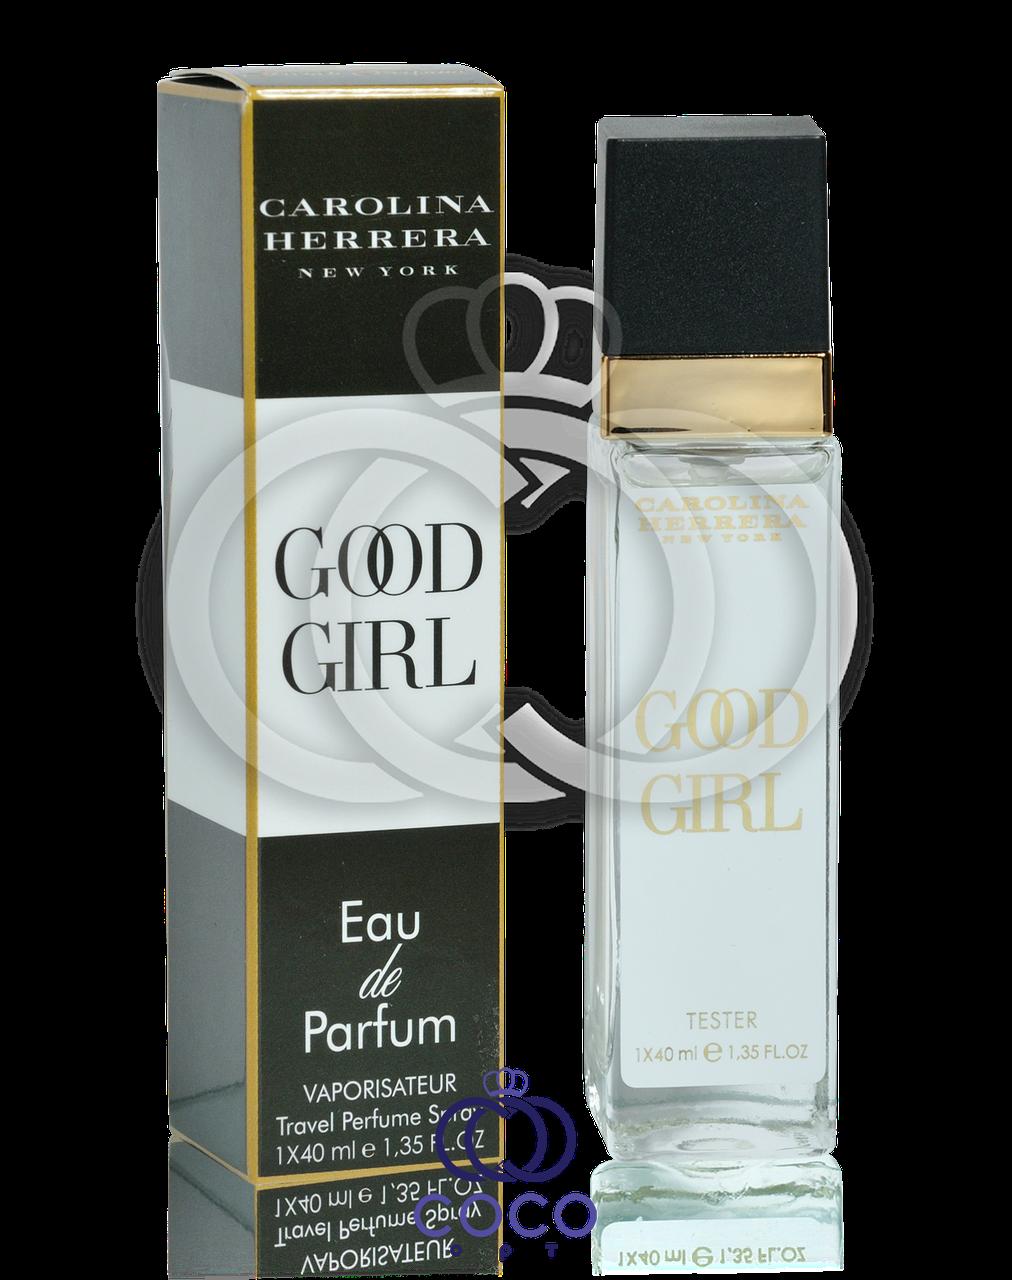 Женский мини парфюм Carolina Herrera Good Girl (тестер) 40 мл